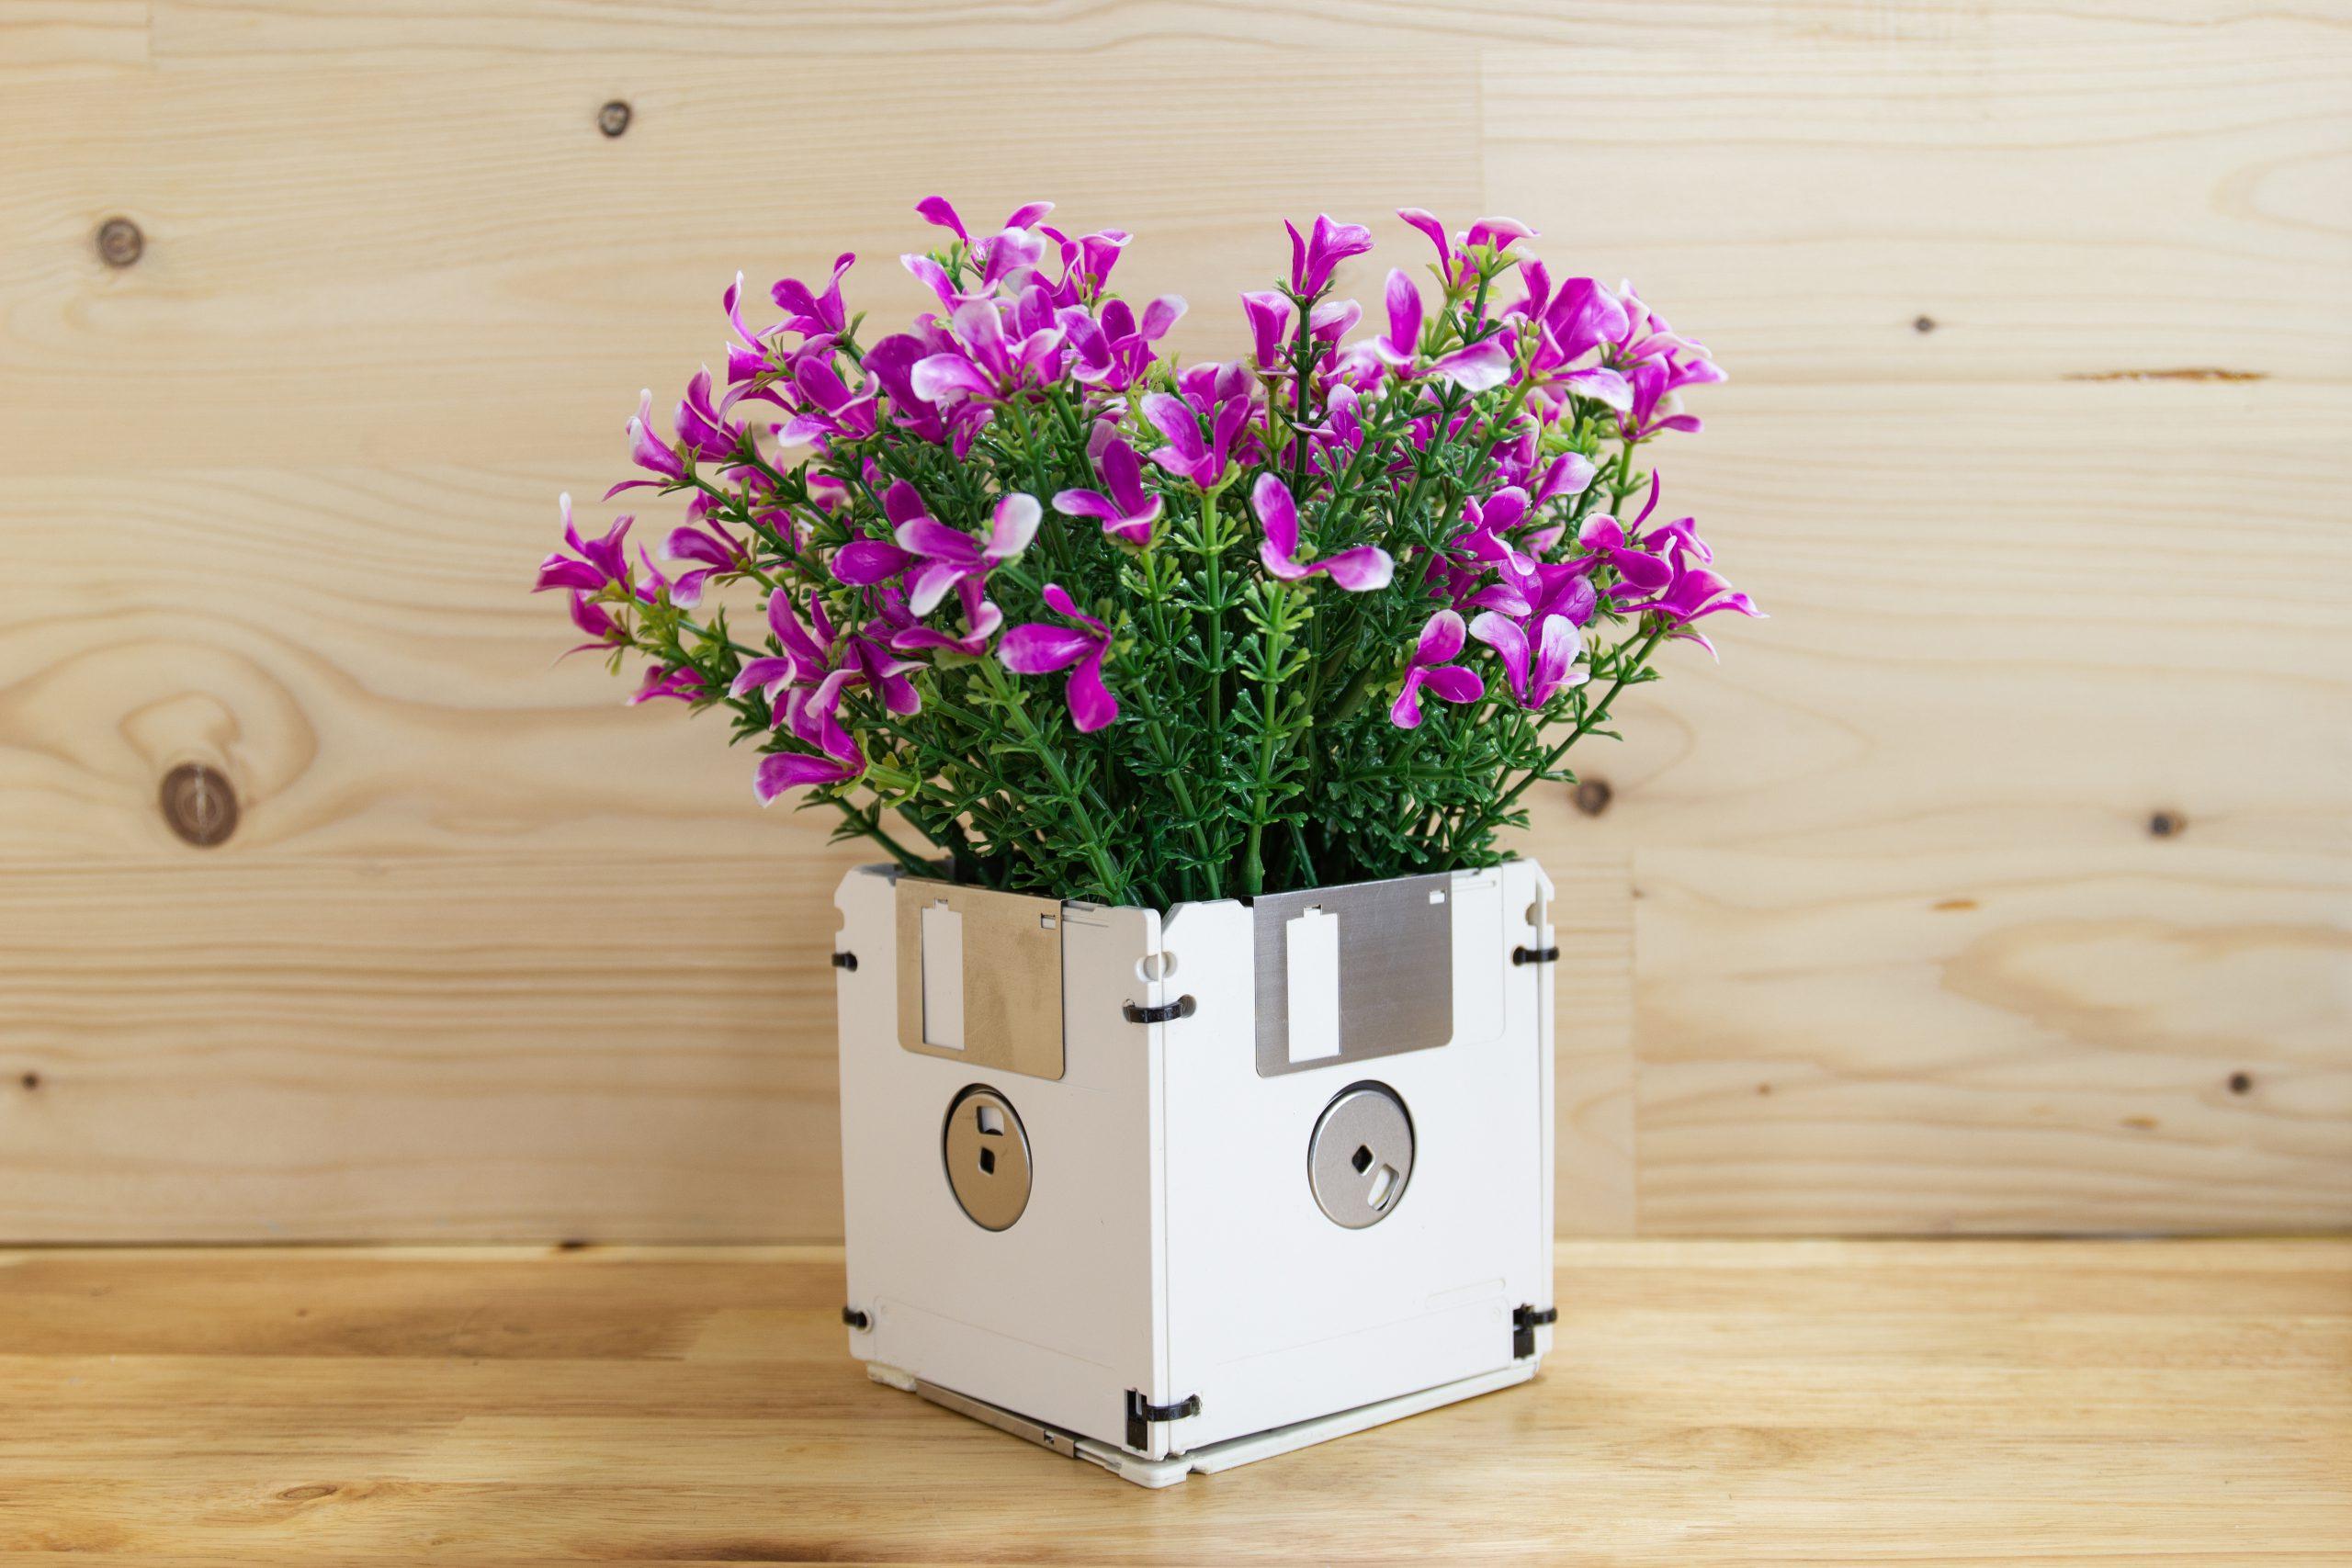 Data storage as a vase